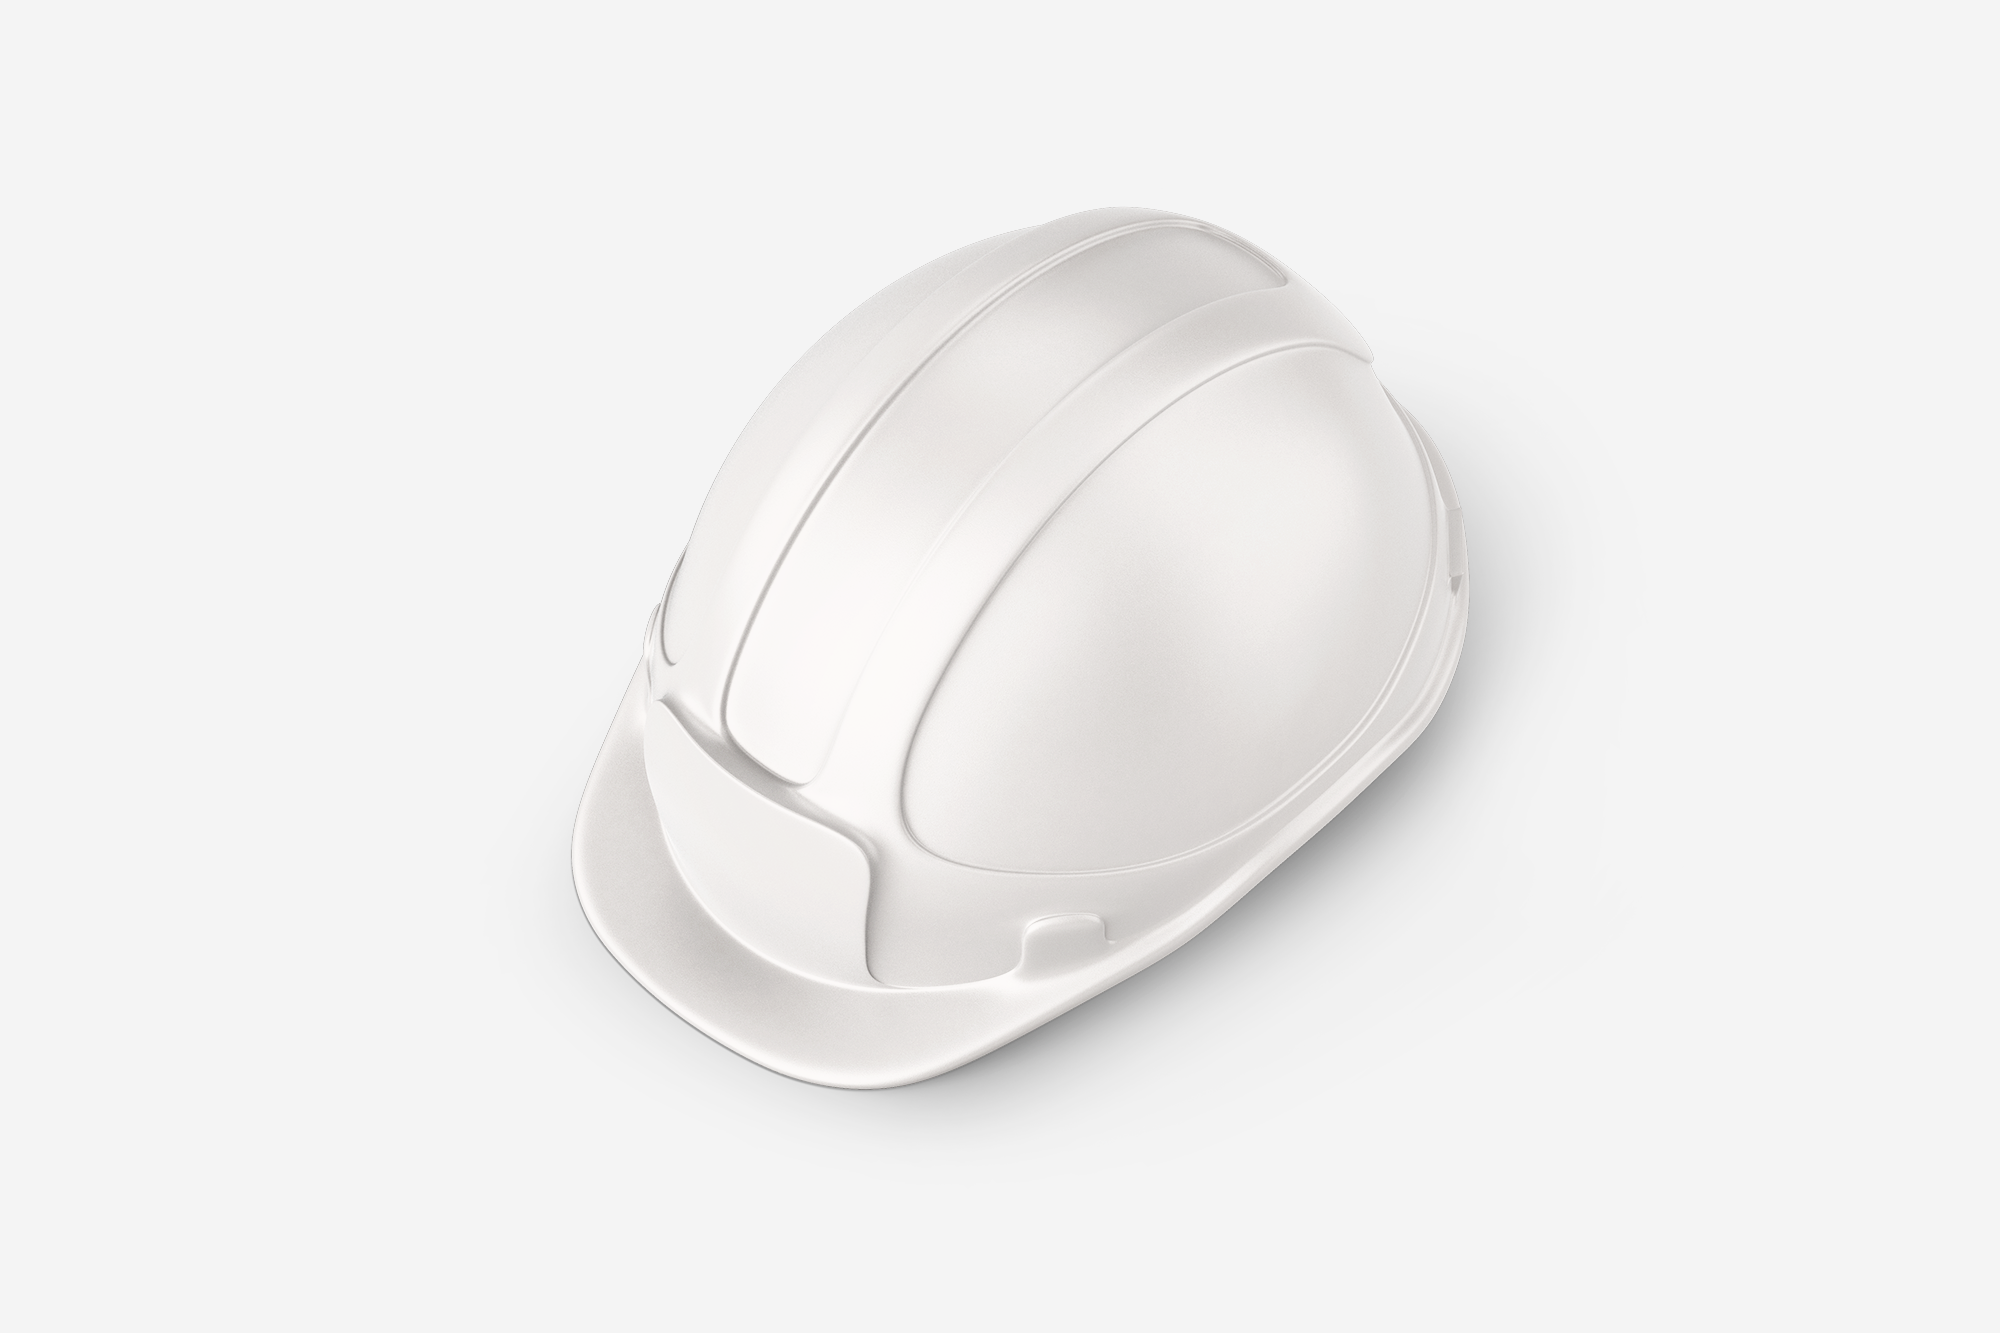 Free Construction Hard Hat Mockup